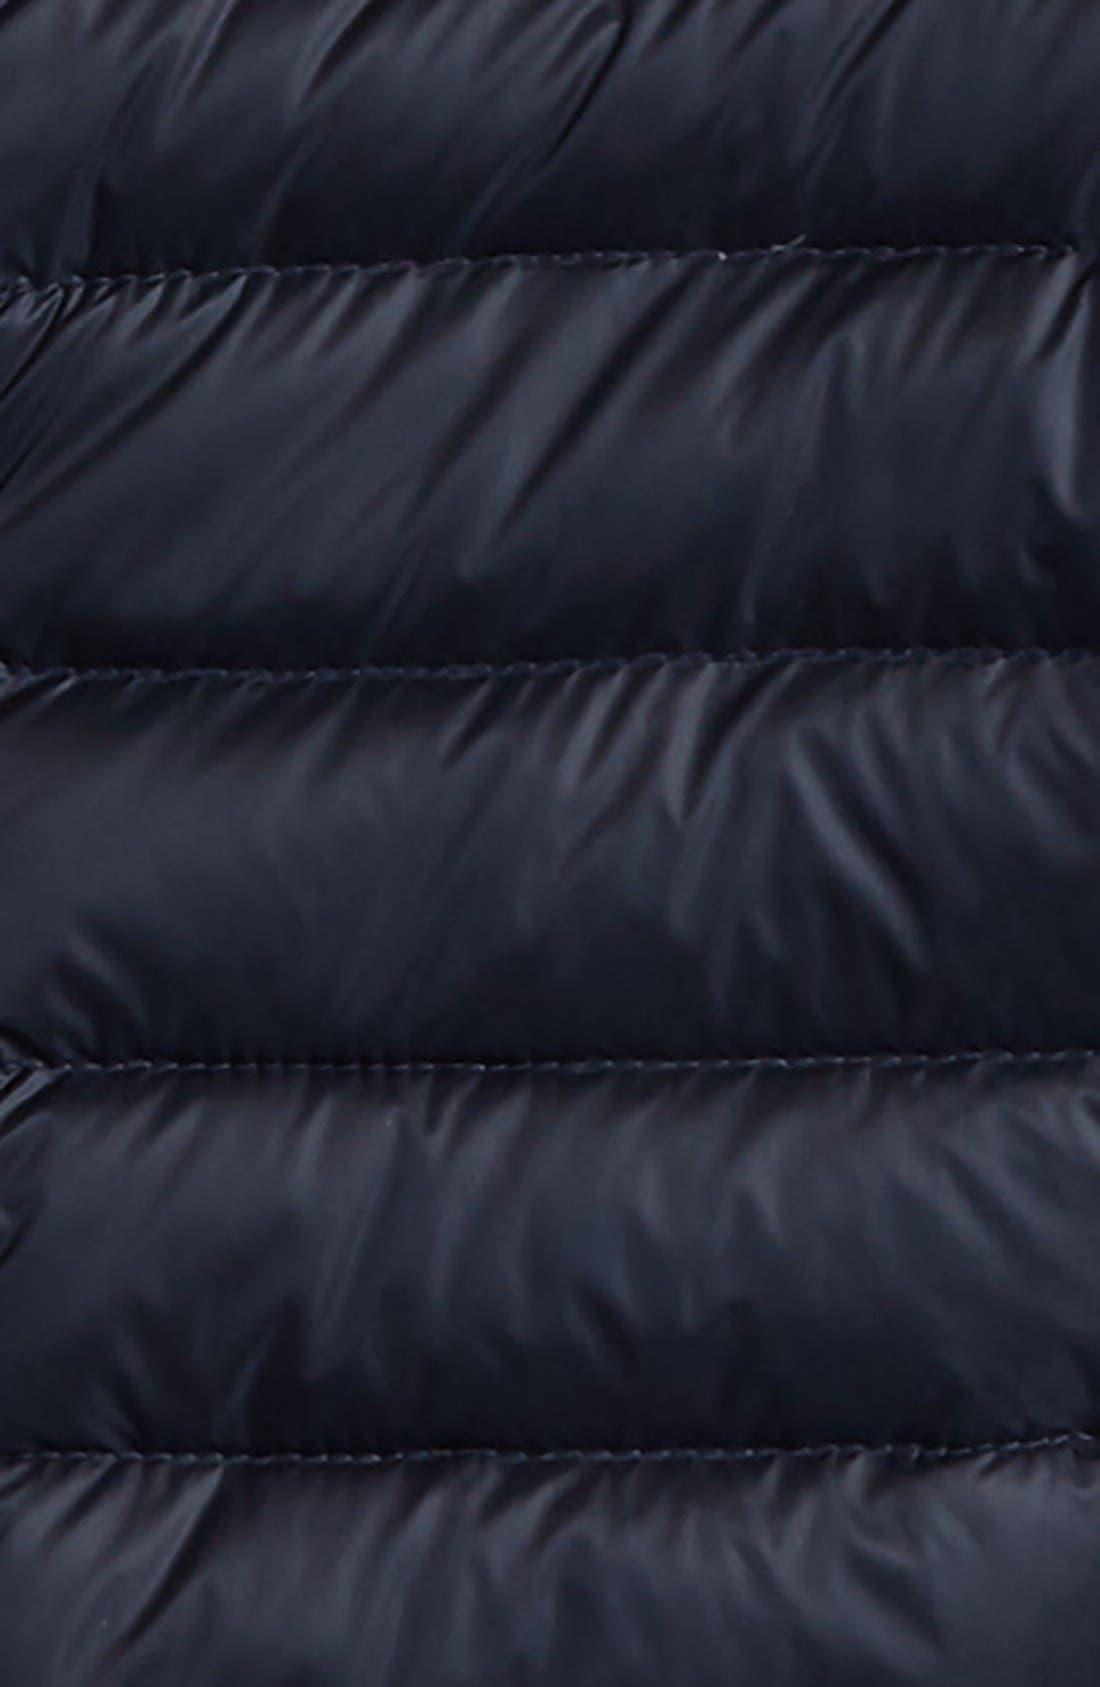 Ambrine Water Resistant Down Jacket,                             Alternate thumbnail 2, color,                             Navy